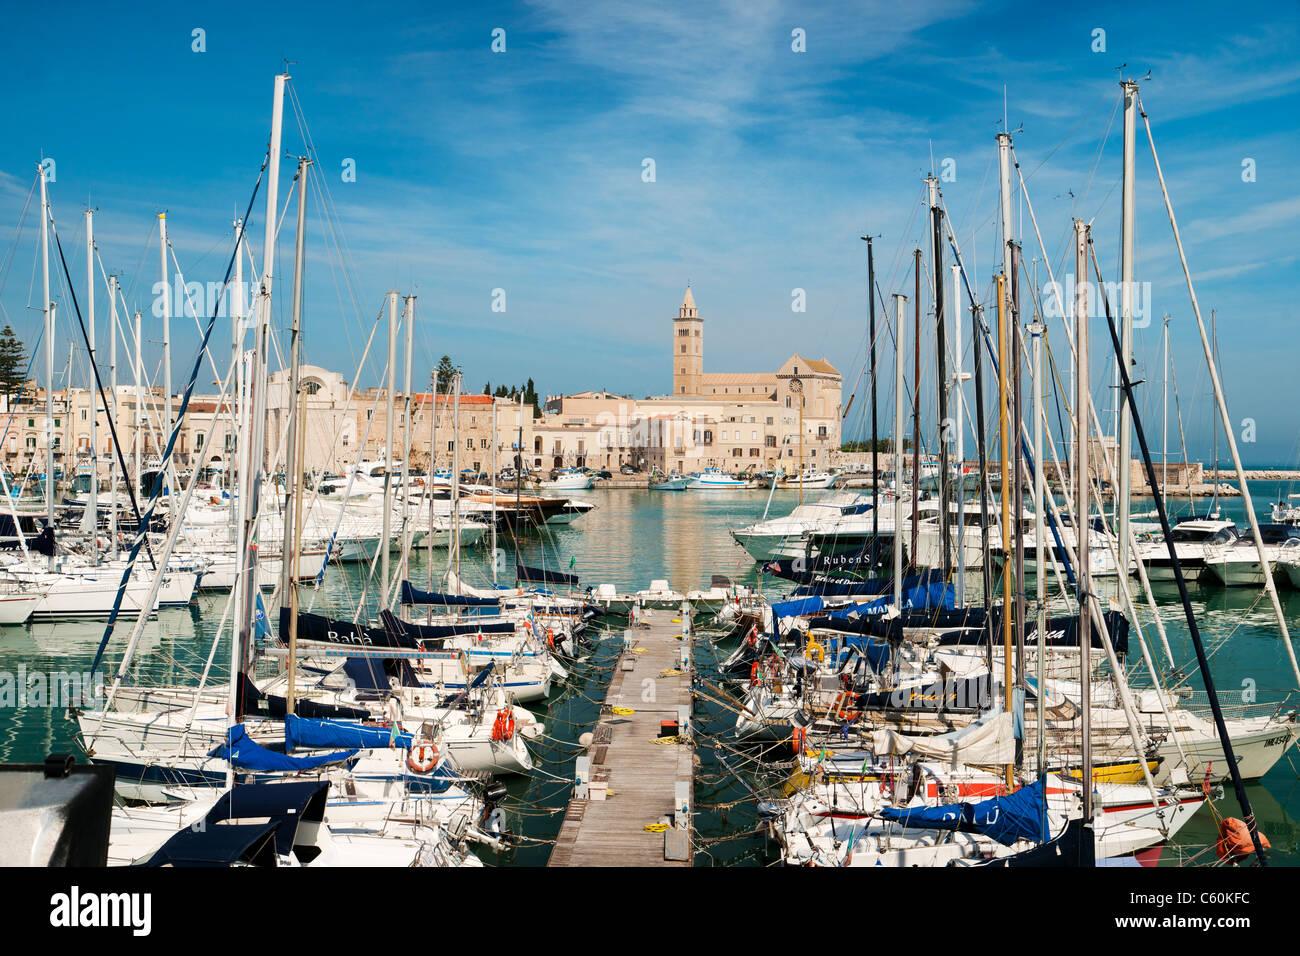 Trani Hafen und Kathedrale, Trani, Süditalien, eu Stockbild